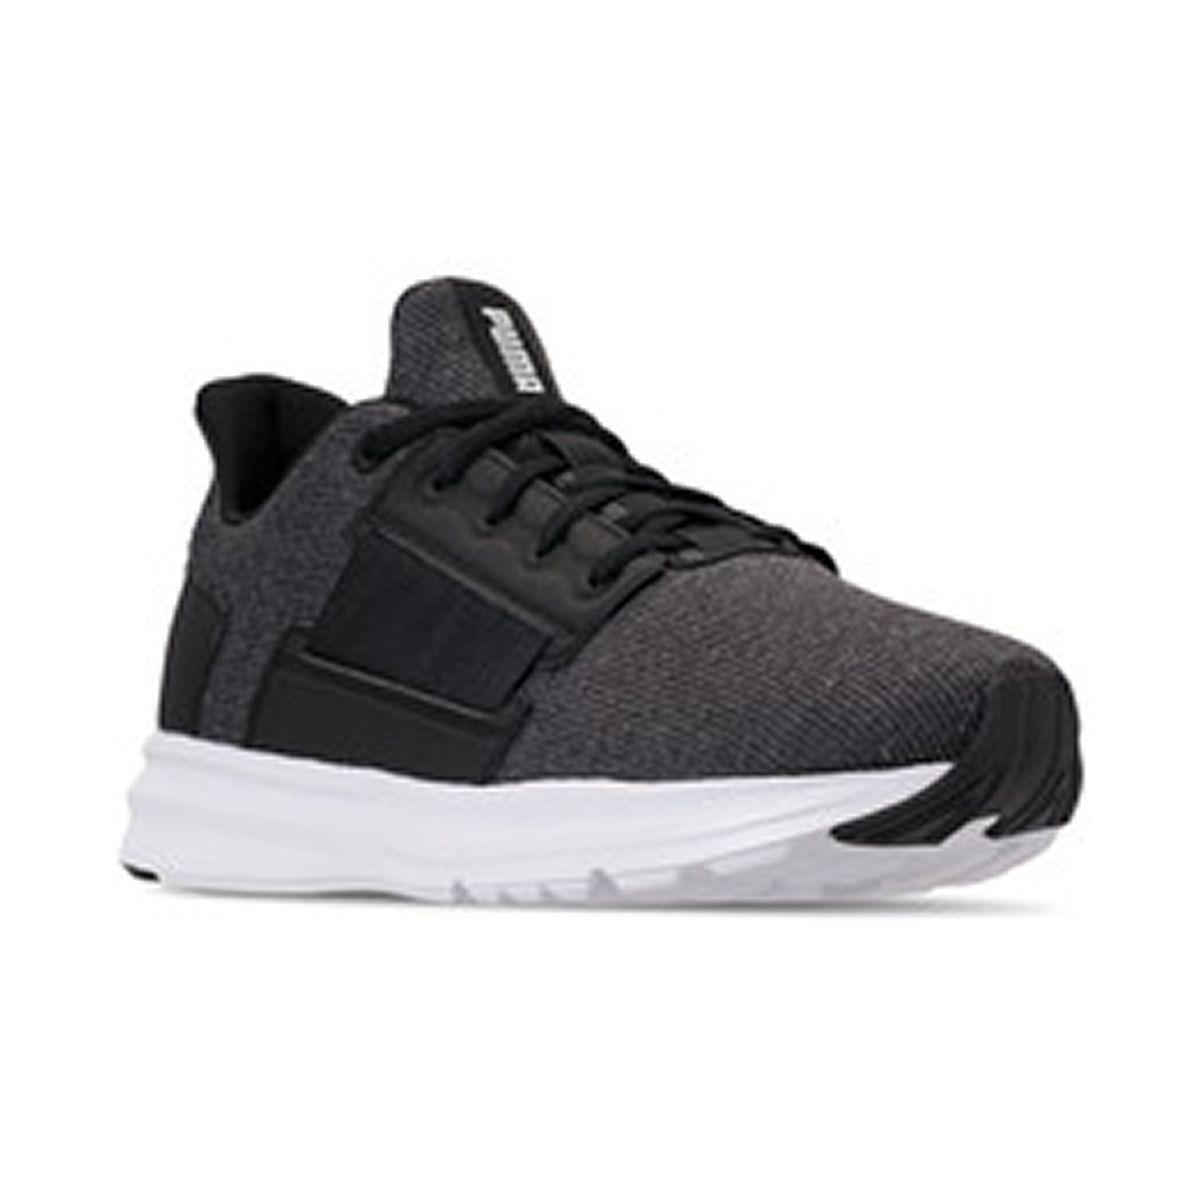 b3b06deda0a826 Finish Line Shoes for Men - Macy s